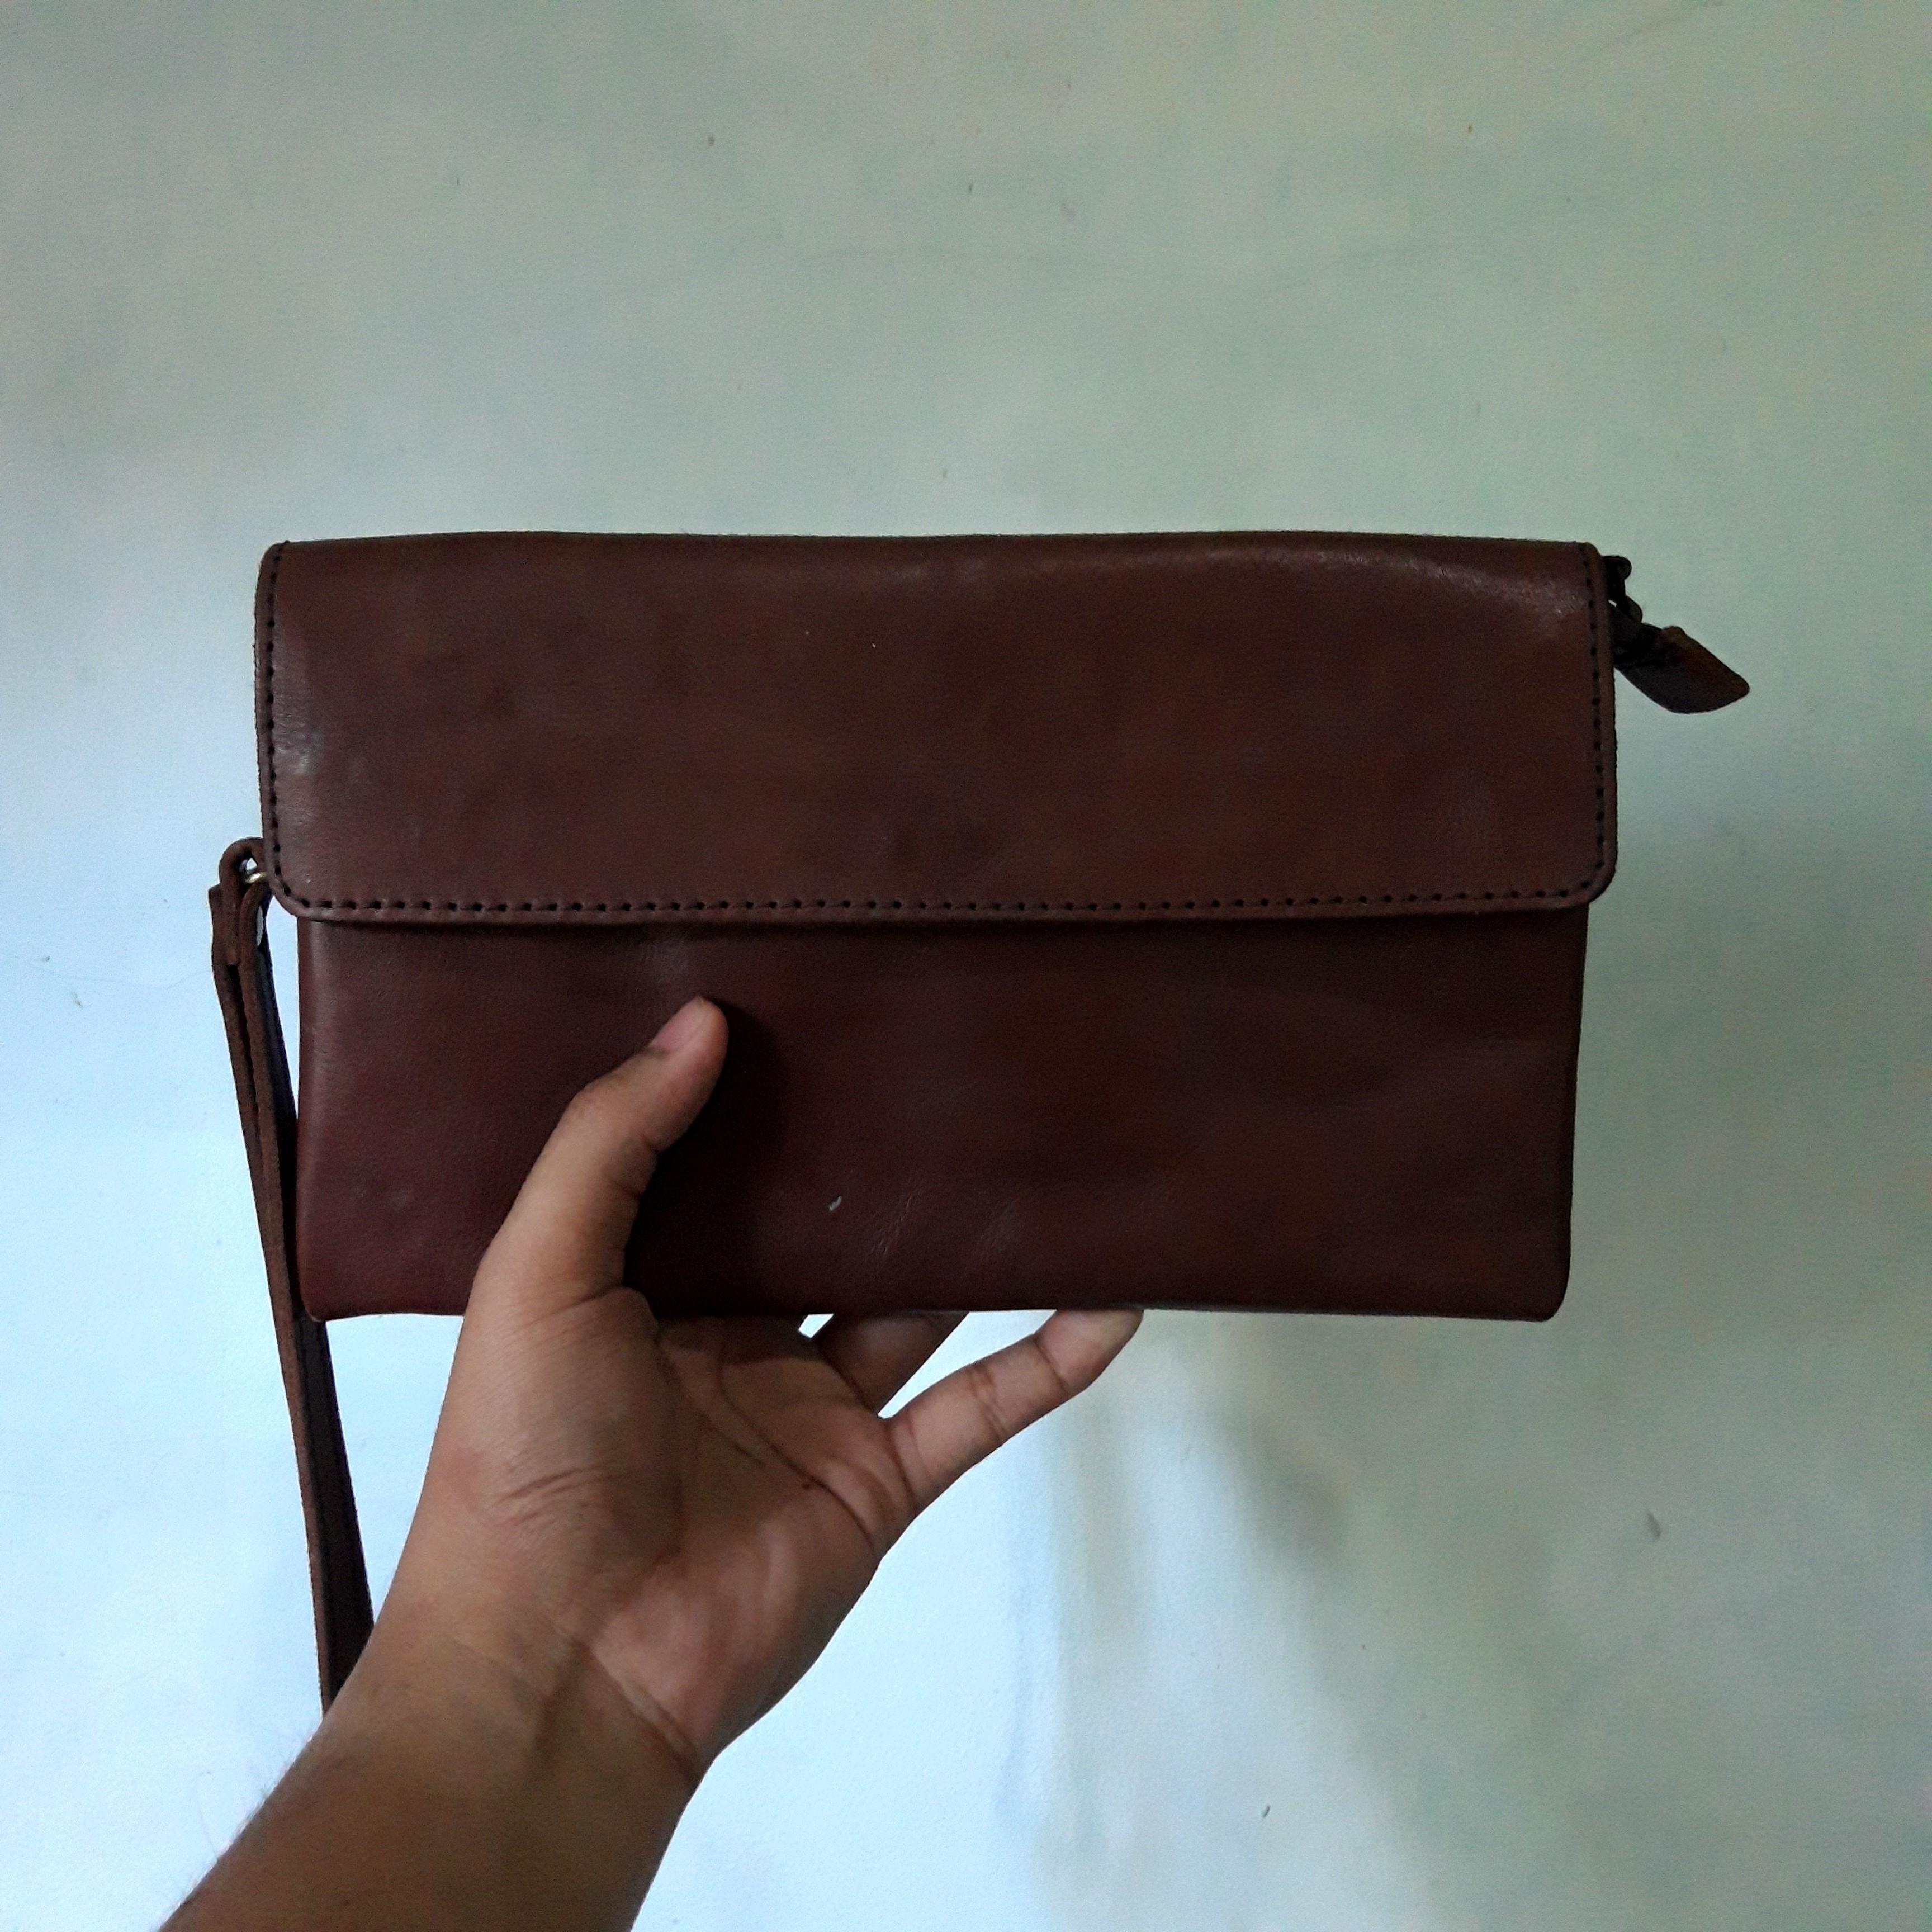 BROWN CLUTCH LEATHER BAG PRIA (Clutch Bag Kulit) #1111special